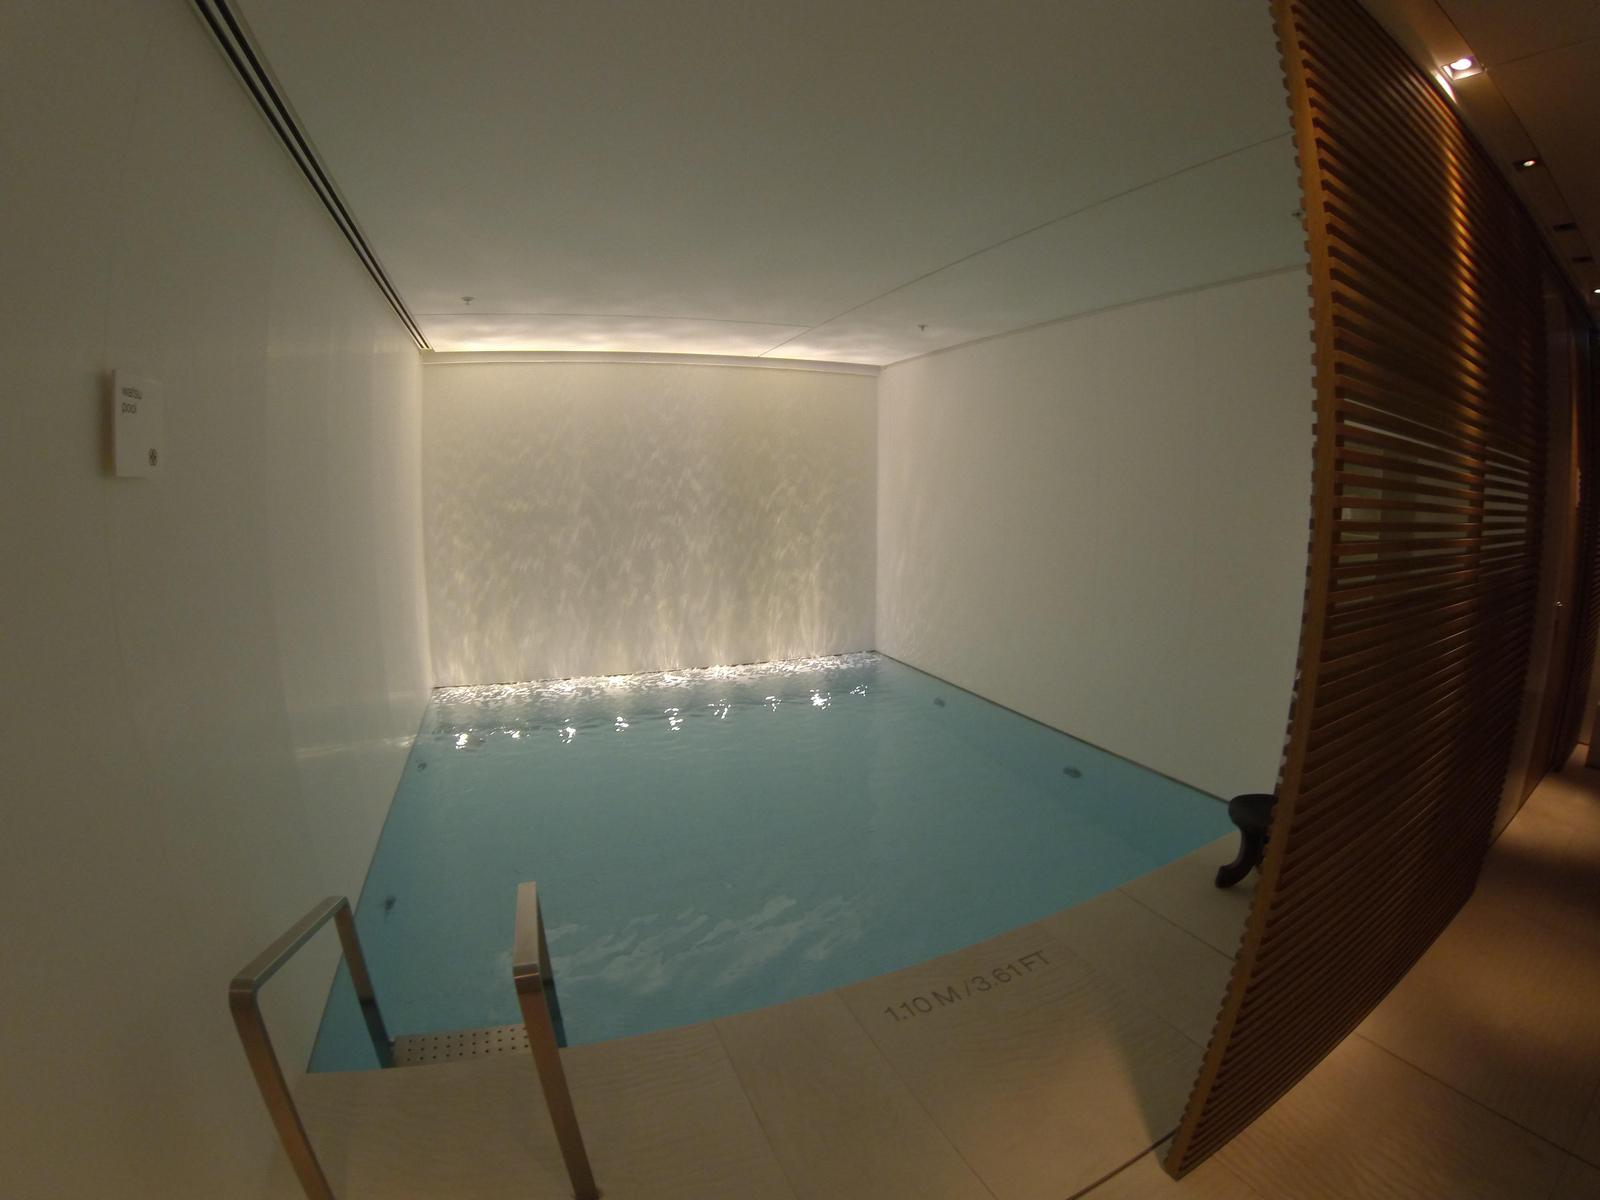 conservatorium-hotel-spa-watsu-pool-waterfall-wall.jpg